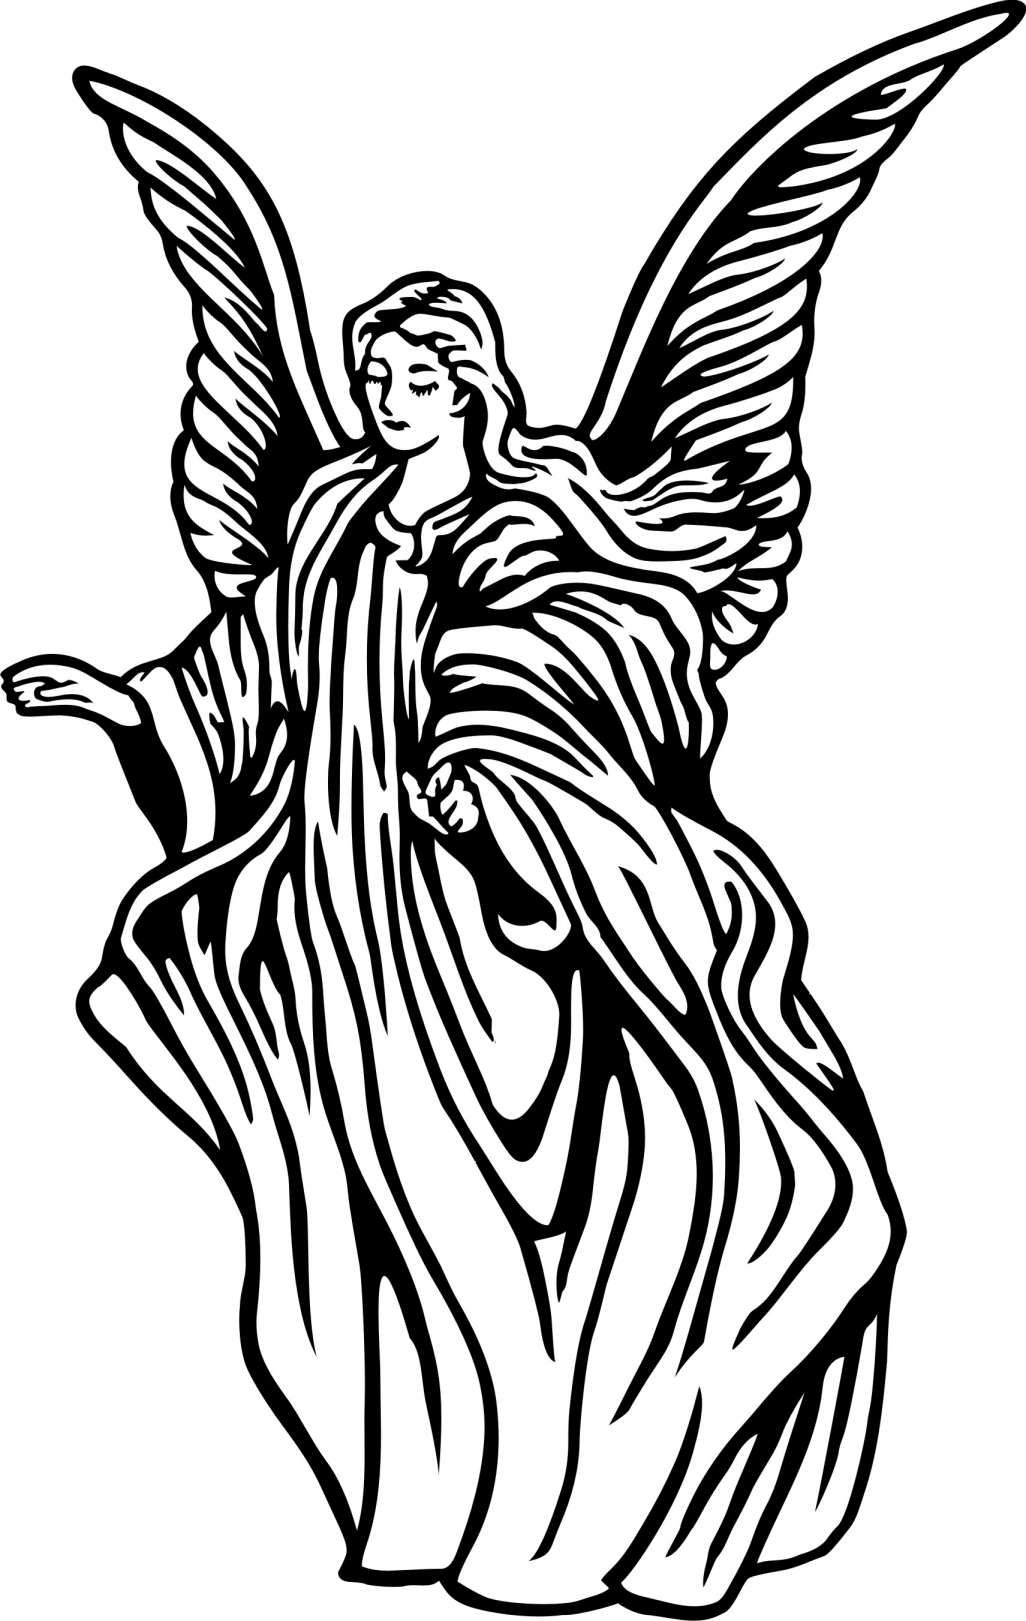 17 Drawings Of Angels Drawingwow Com Angel Drawing Angel Clipart Angel Wings Clip Art